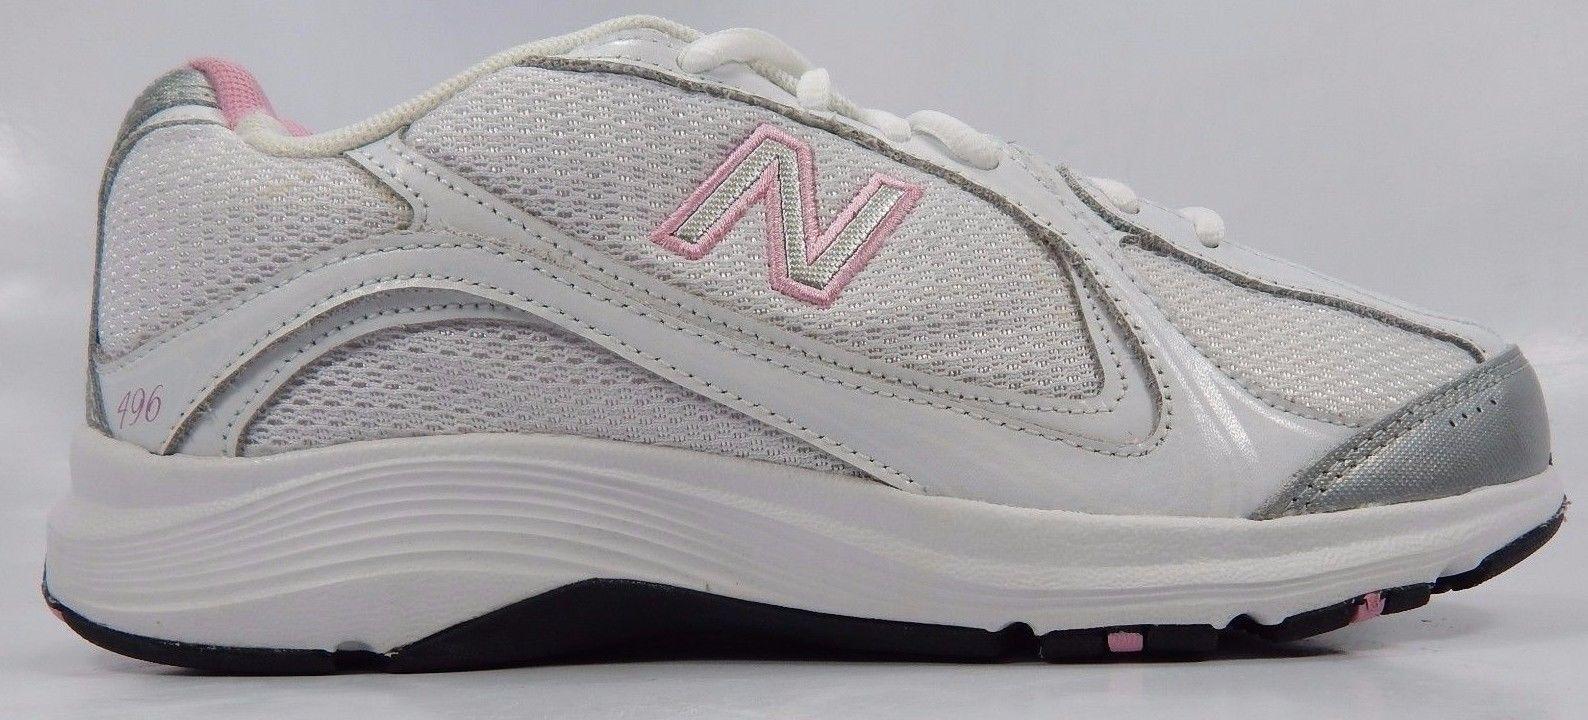 b41c831c59de New Balance 496 Women s Walking Shoes Size US 8.5 M (B) EU 40 White ...